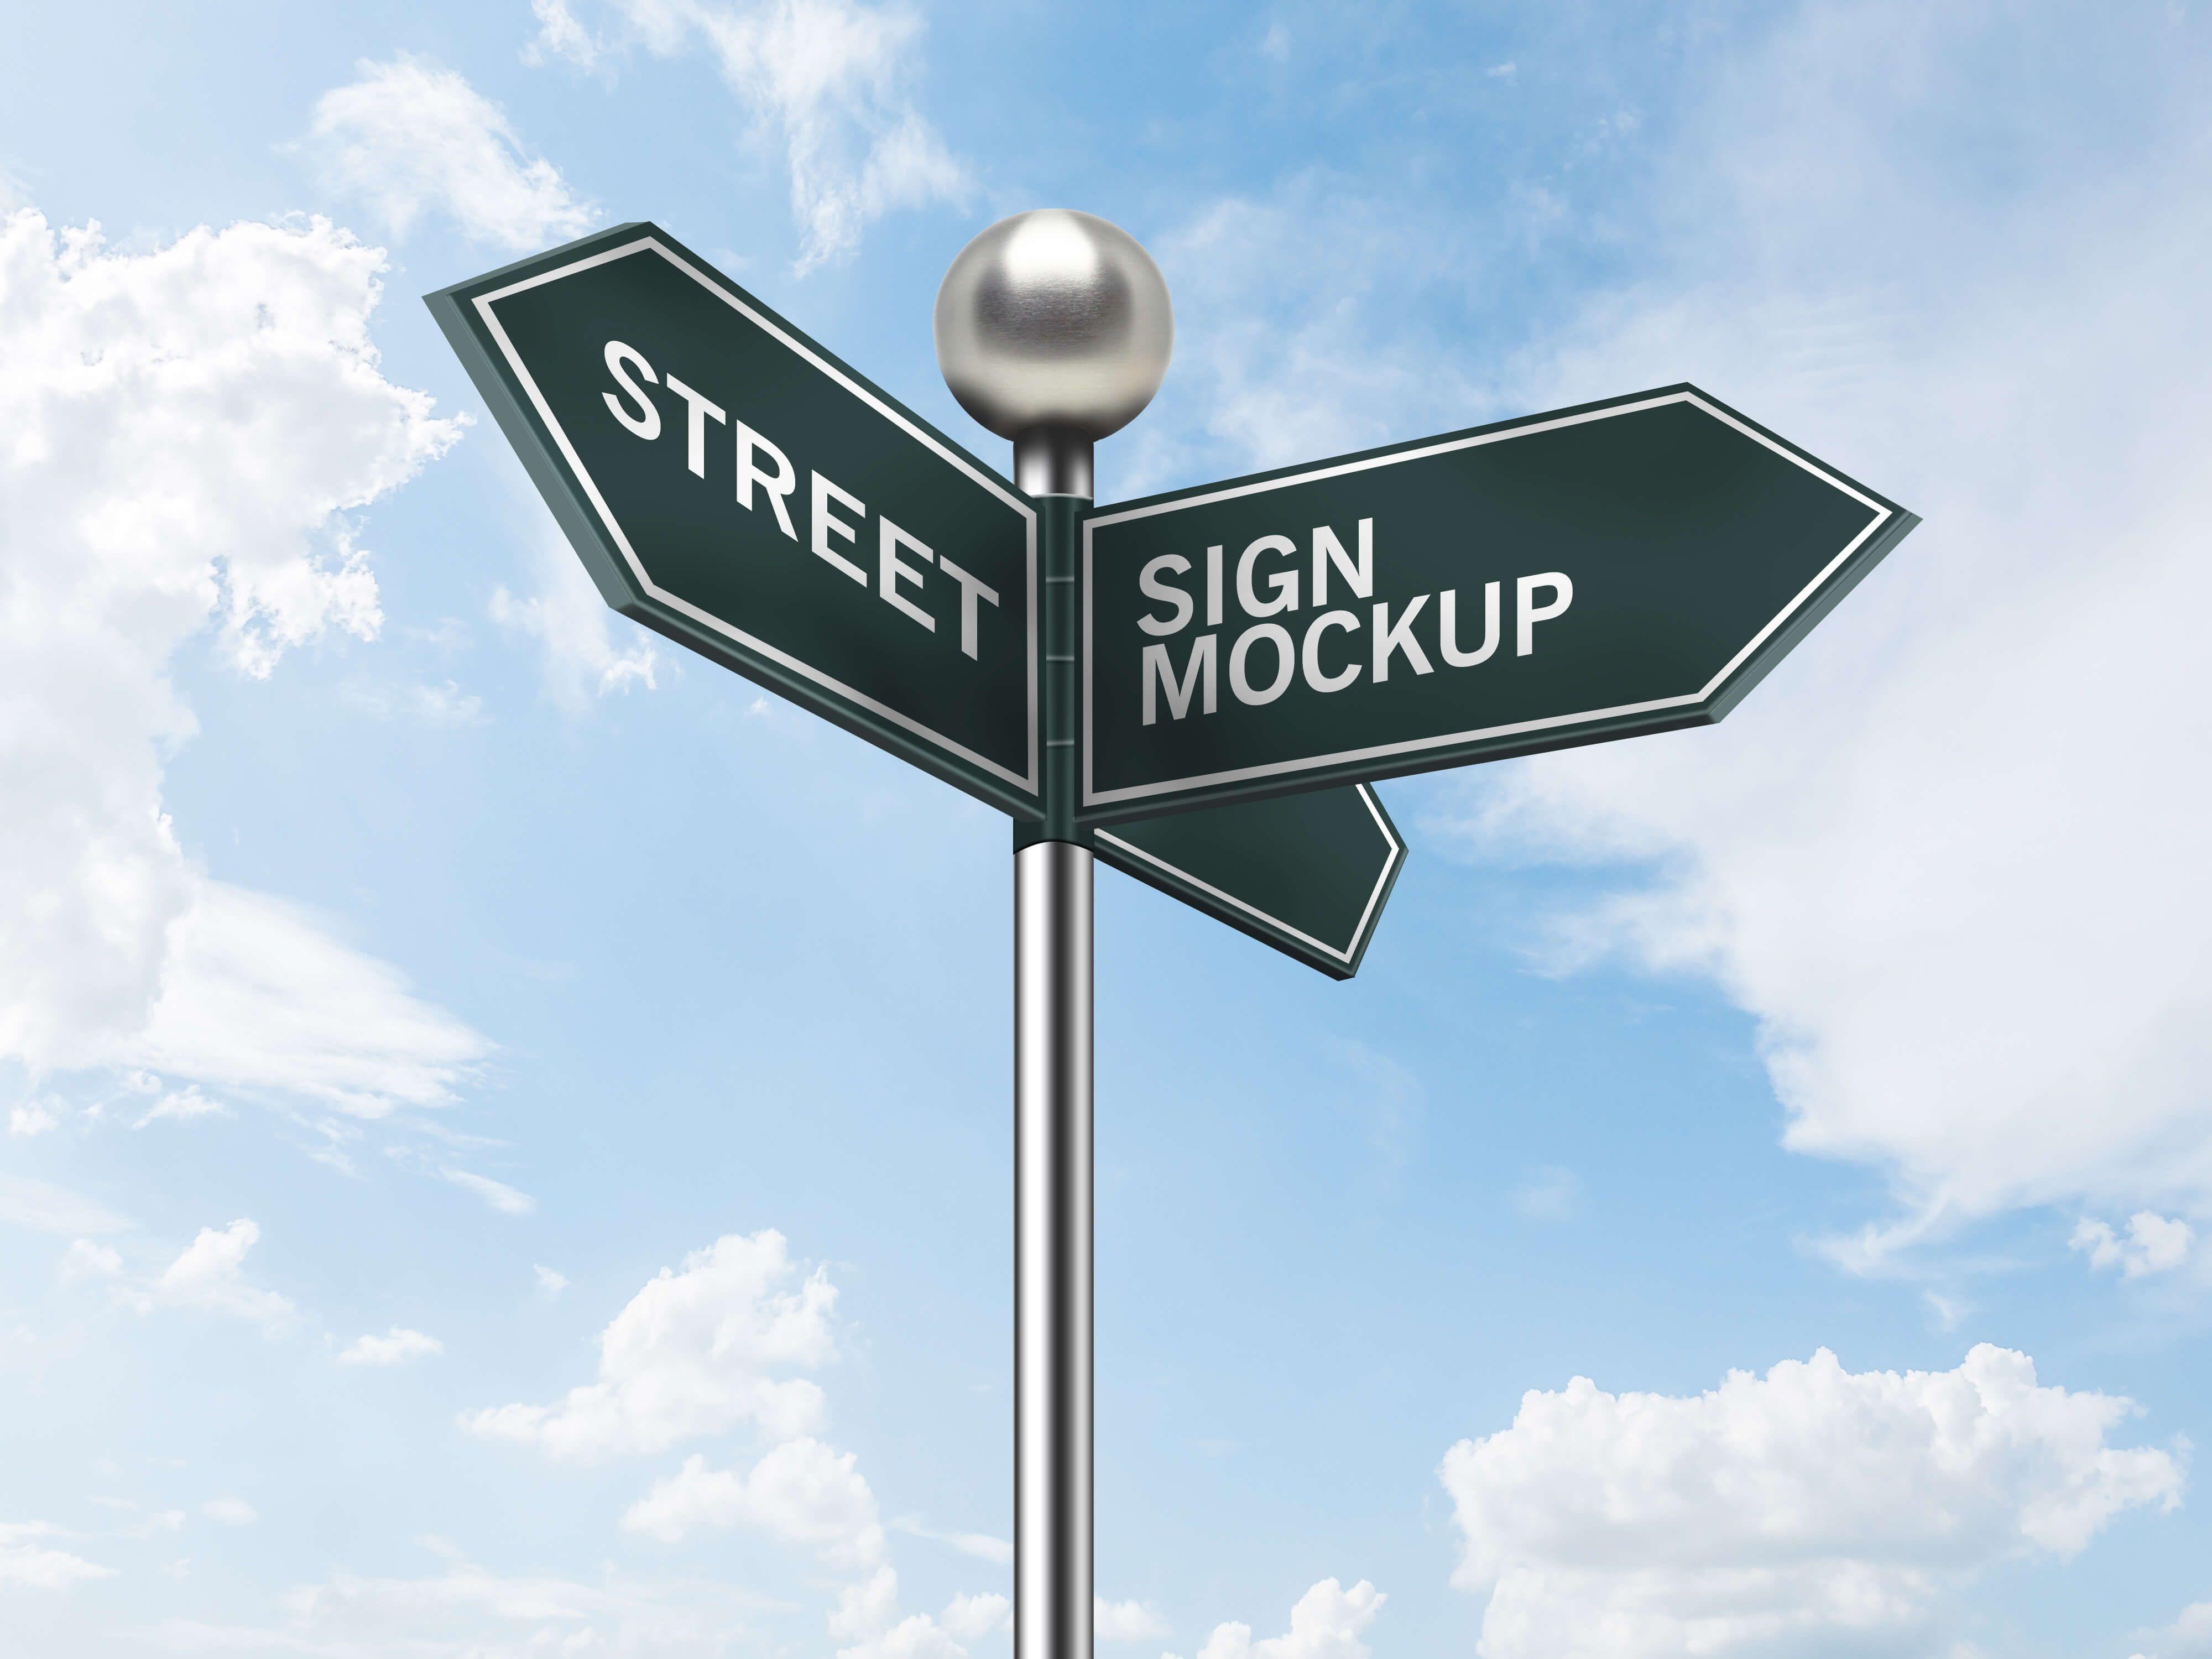 Sky View Street Sign Board Mockup Psd Template Street Signs Sign Board Design Sign Mockup